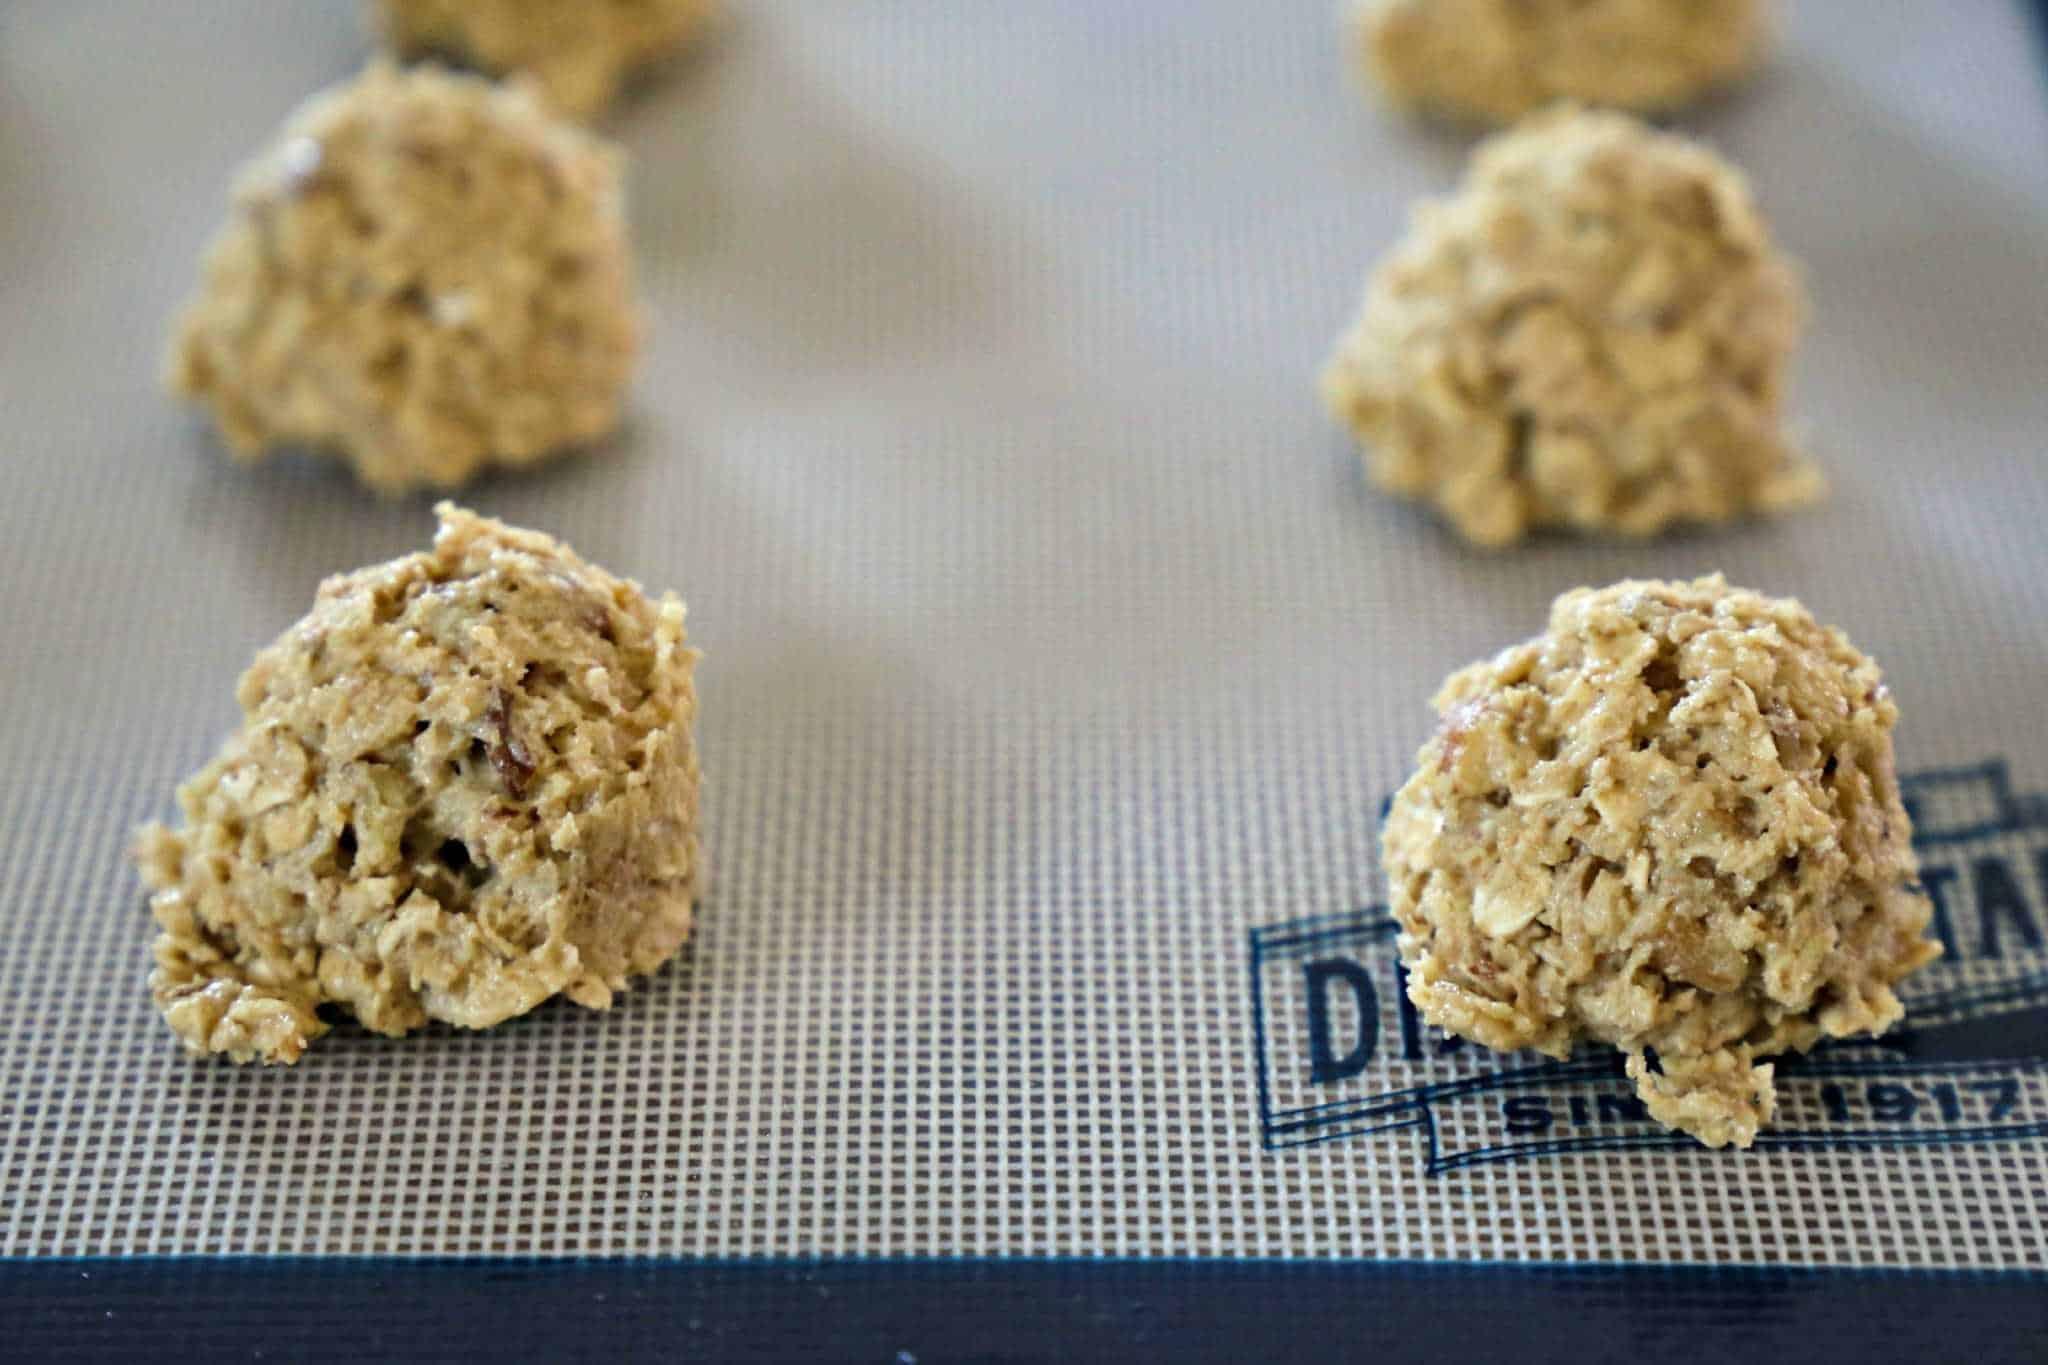 cookie Dough Balls on Silpat